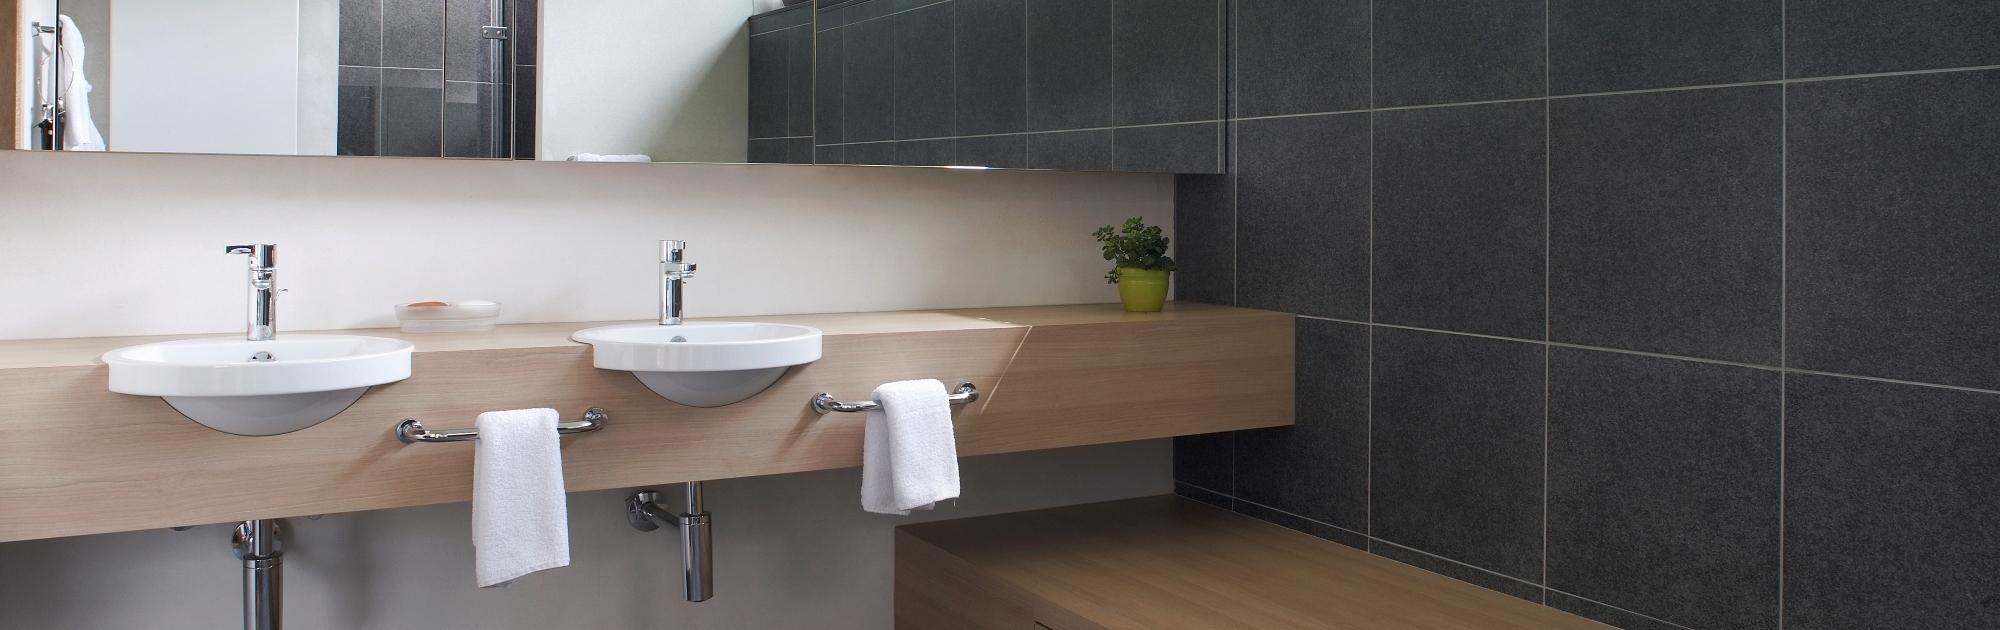 Badkamer en badkamermeubel op maat | Elst Keukens